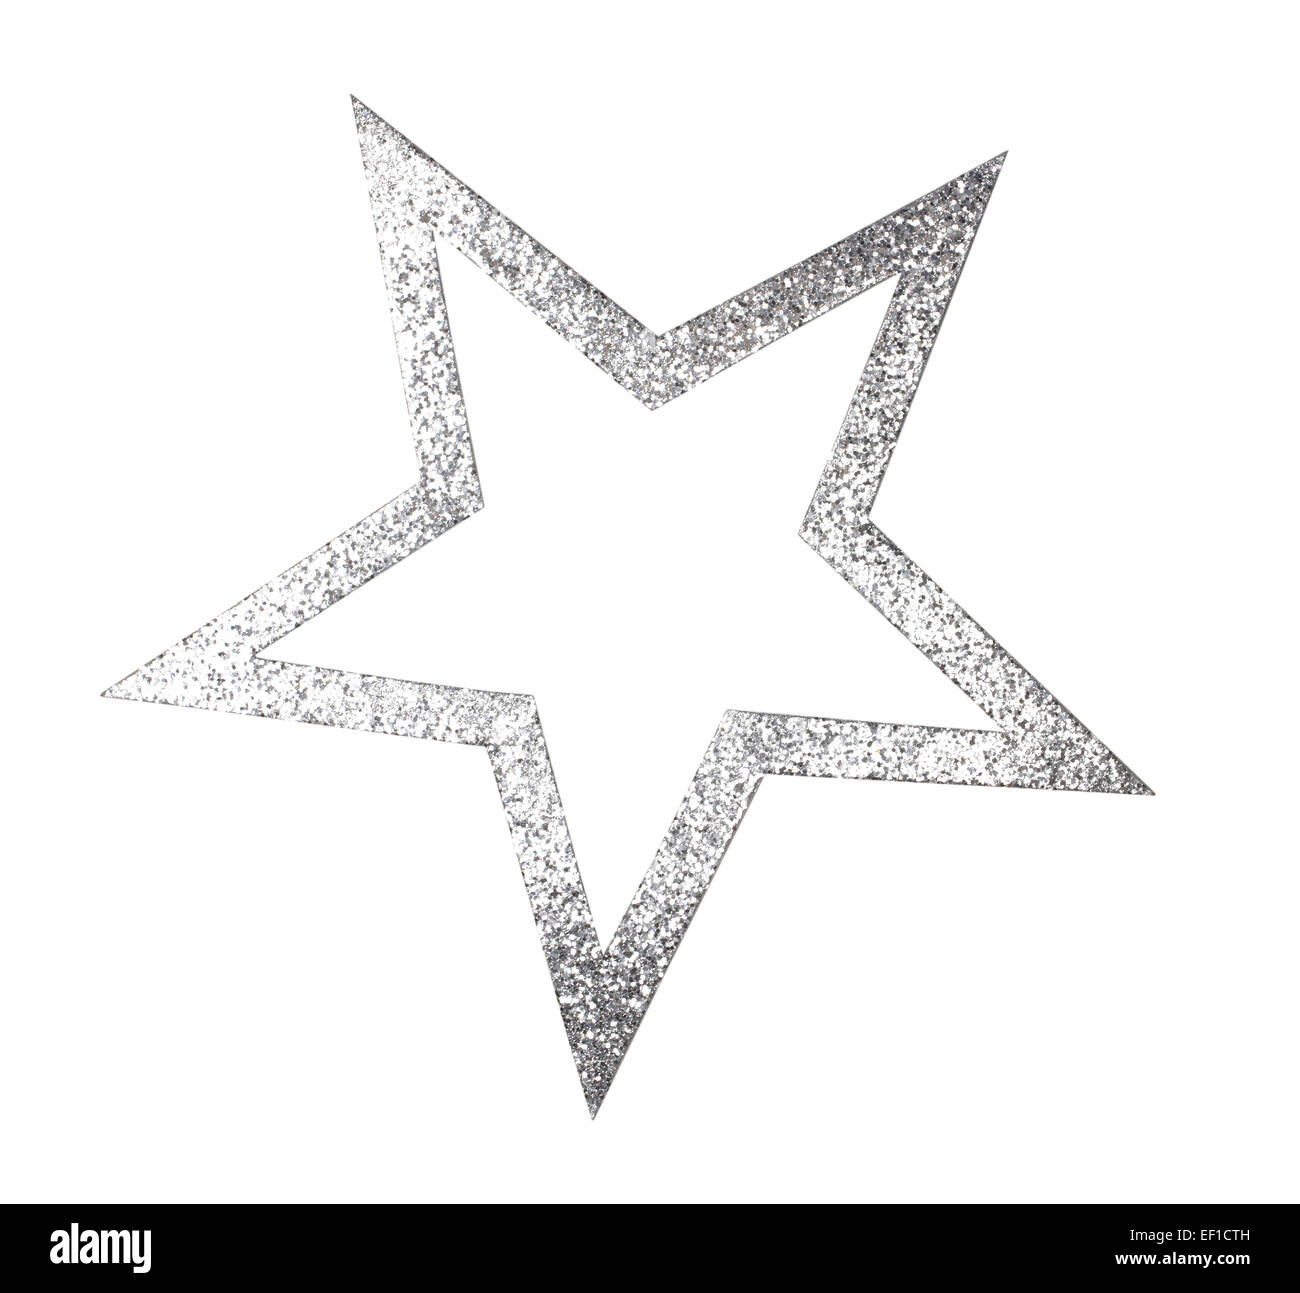 Silver Glittering star cutout - Stock Image